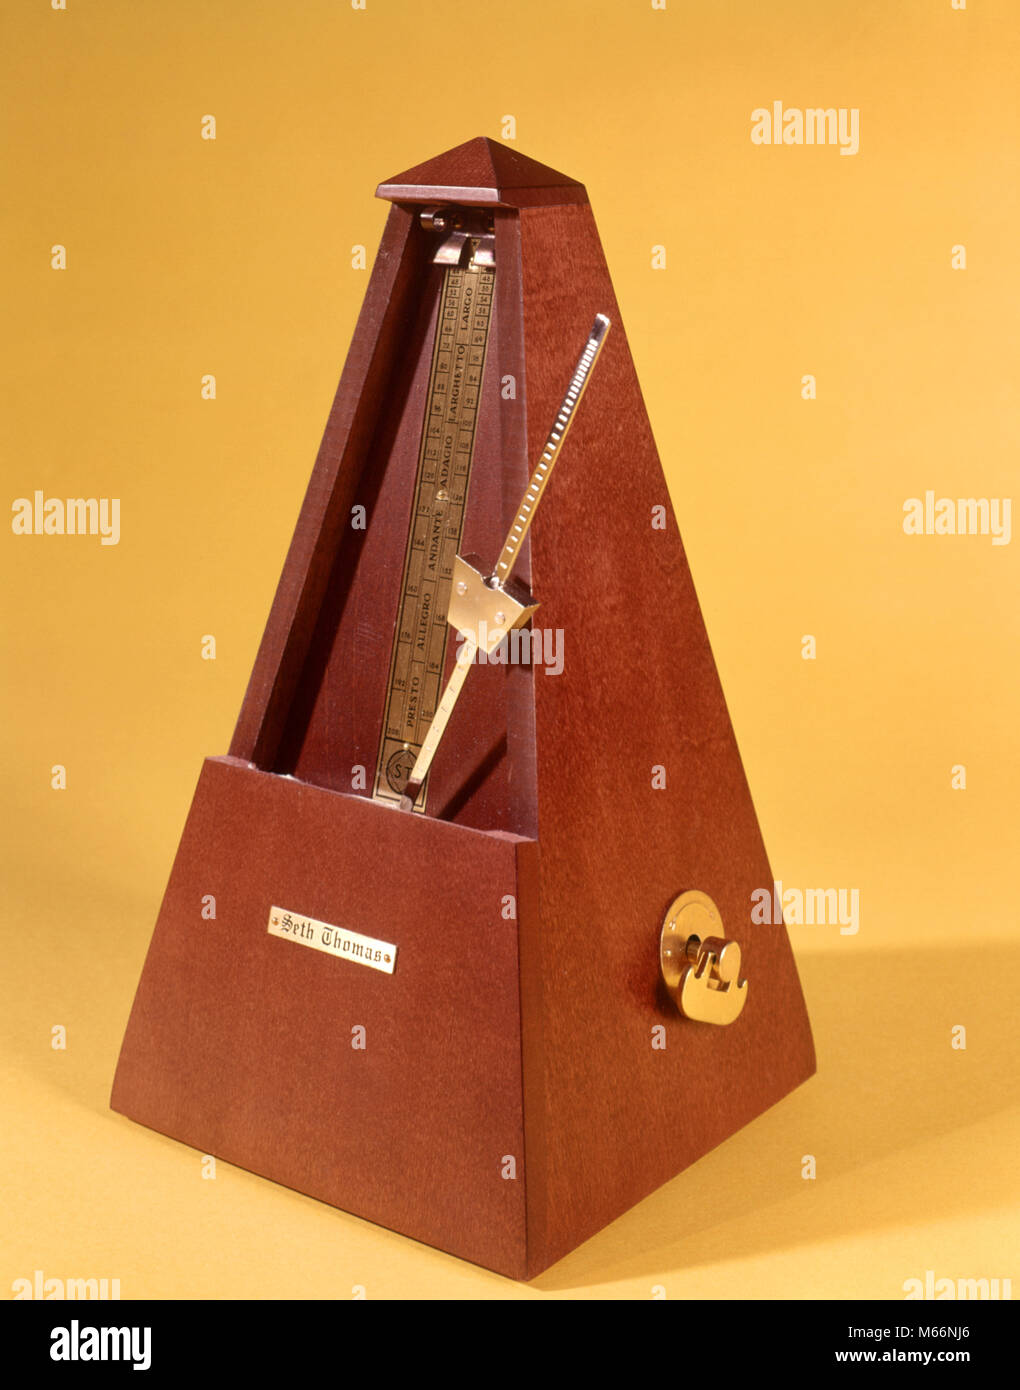 1970s WOODEN METRONOME KEEPING TIME - ks7586 HAR001 HARS BEATS BEATS PER MINUTE BPM CLICK CLICKING EVEN GADGET GIZMO - Stock Image